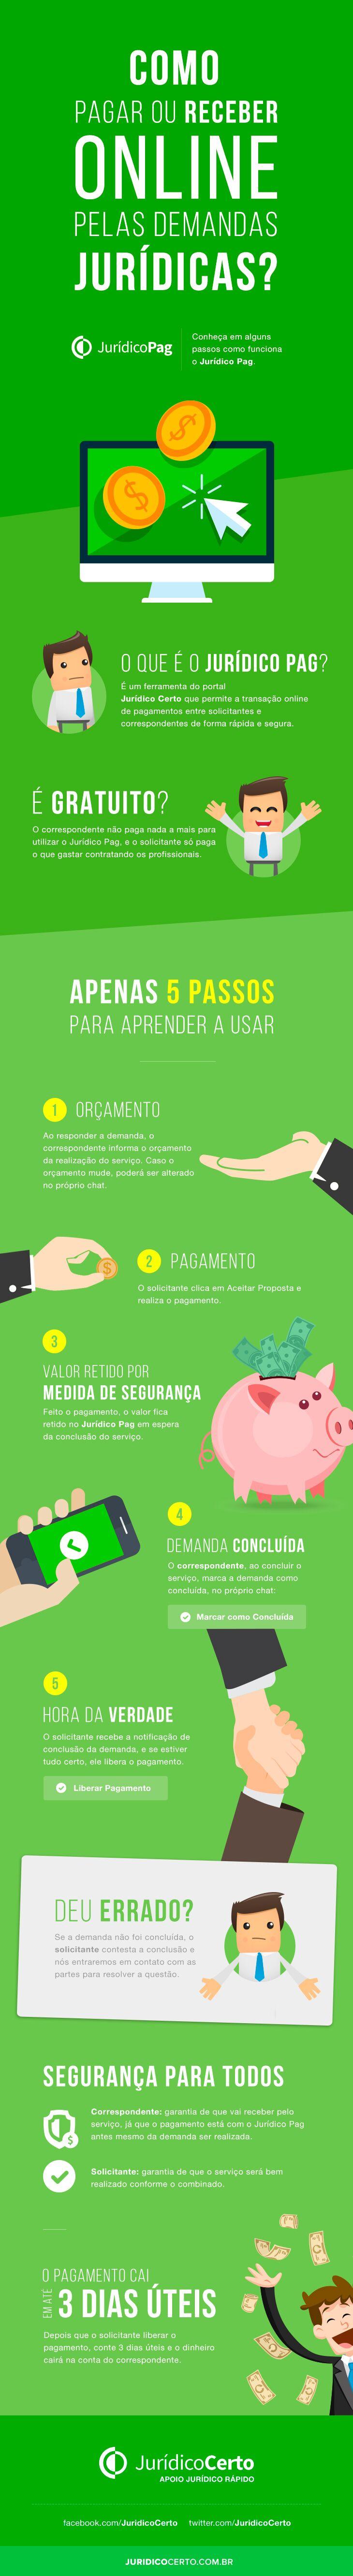 infografico-juridico-pag